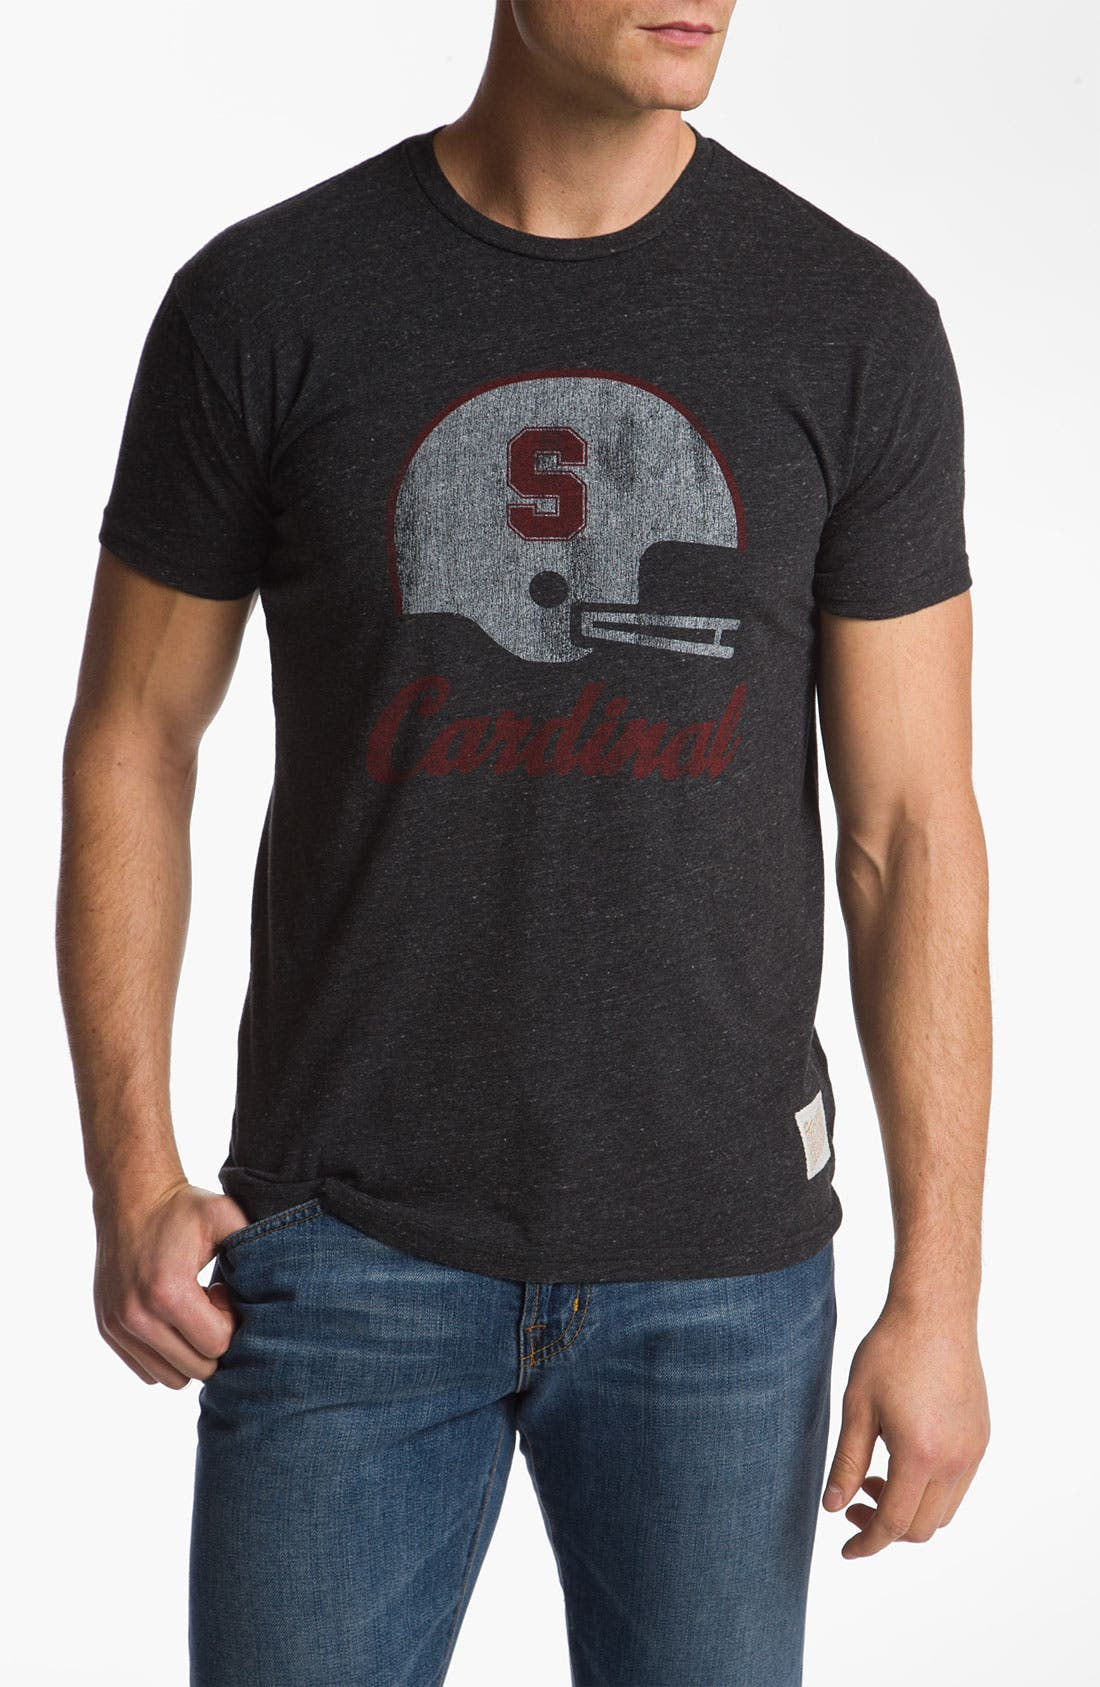 Main Image - The Original Retro Brand 'Stanford Cardinal' Crewneck T-shirt (Men)